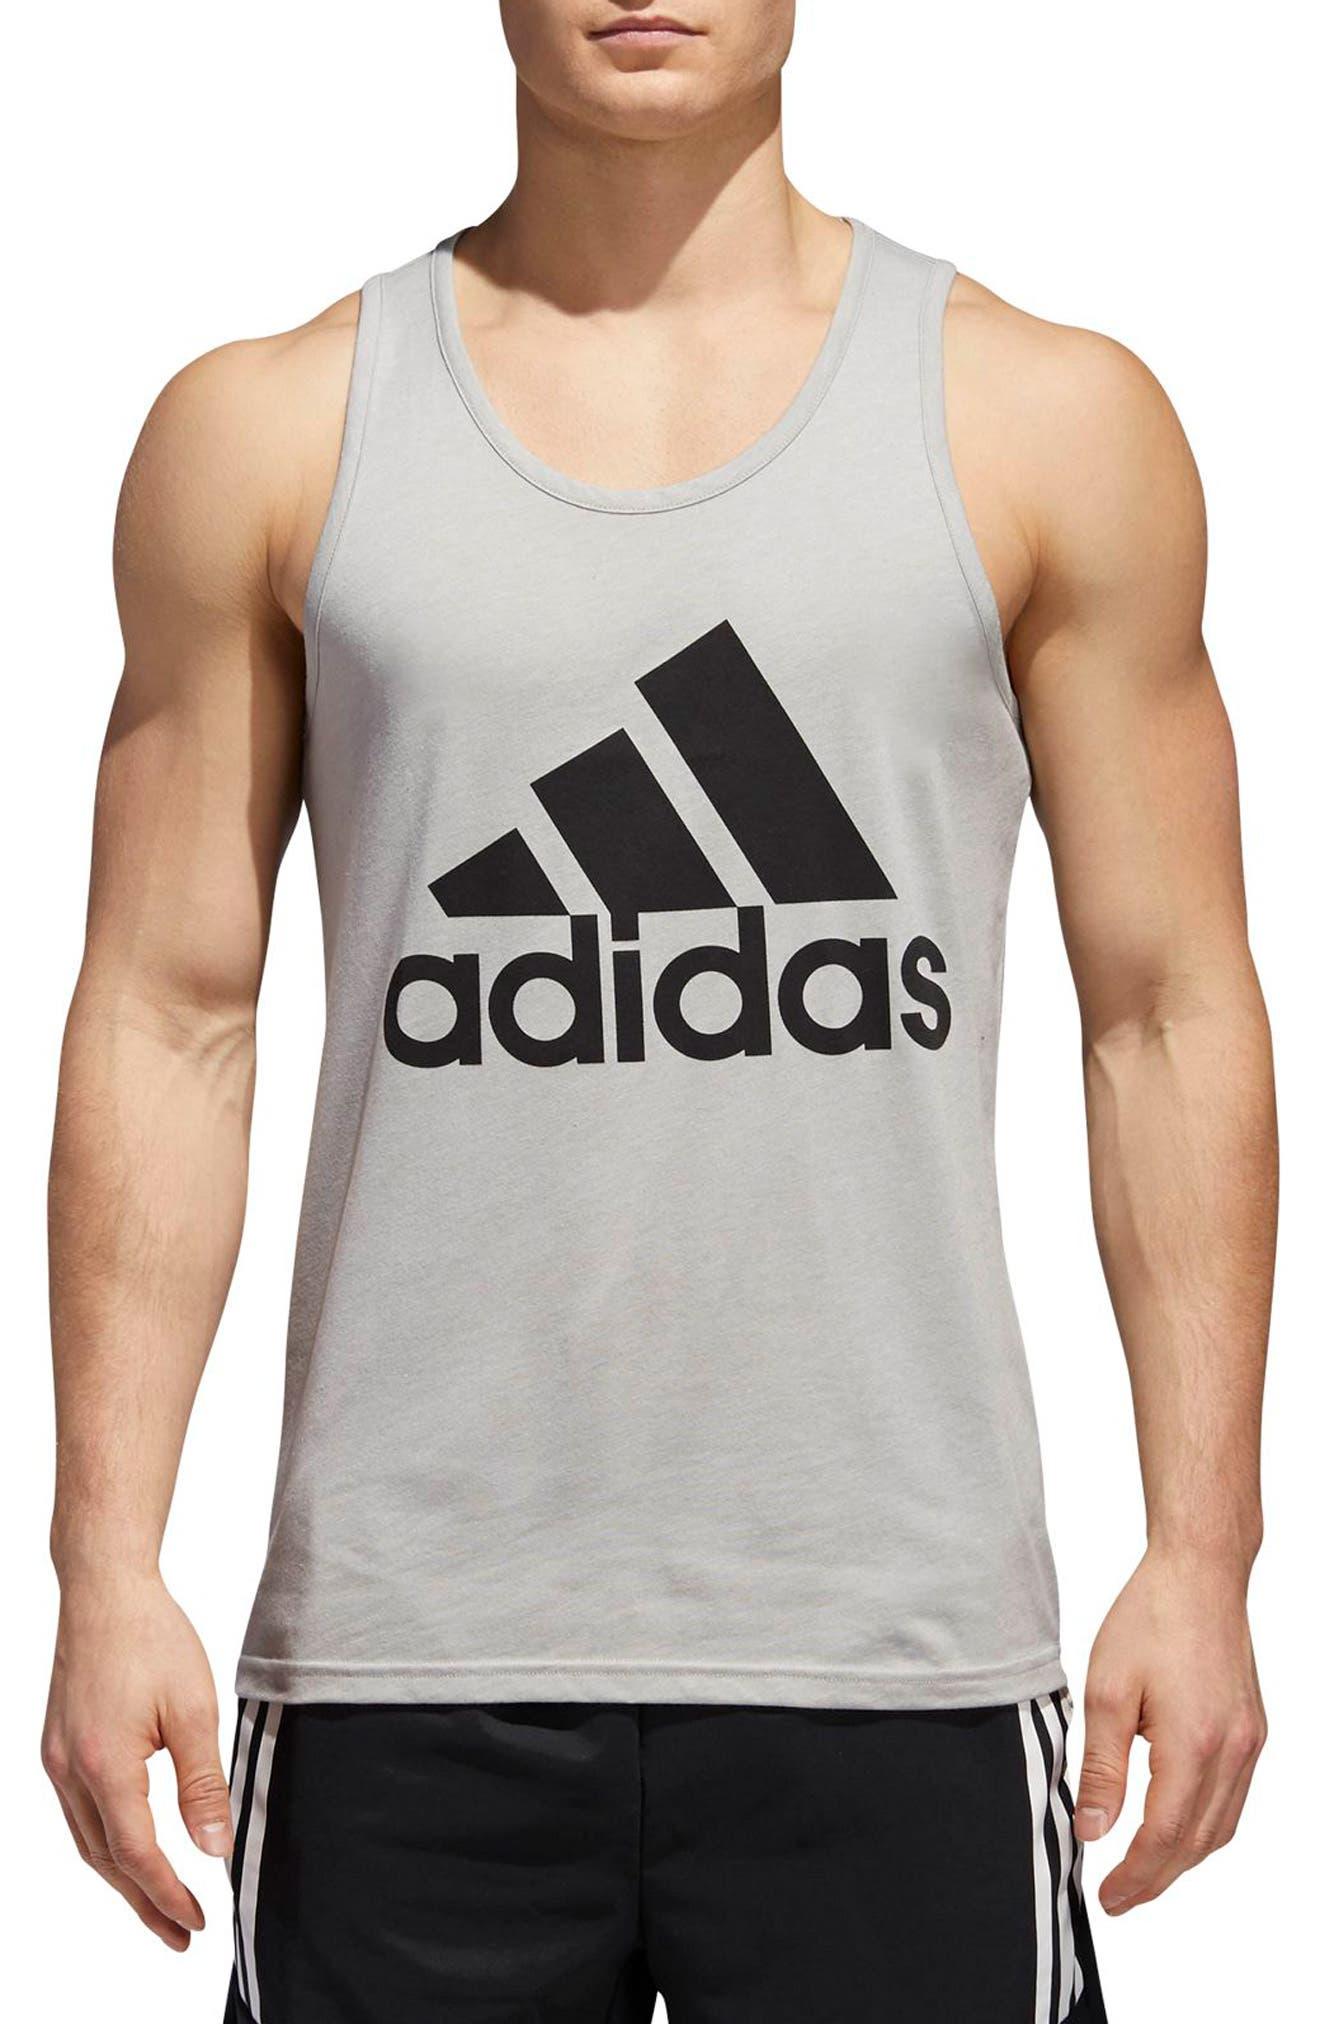 adidas Slim Fit Heathered Logo Tank